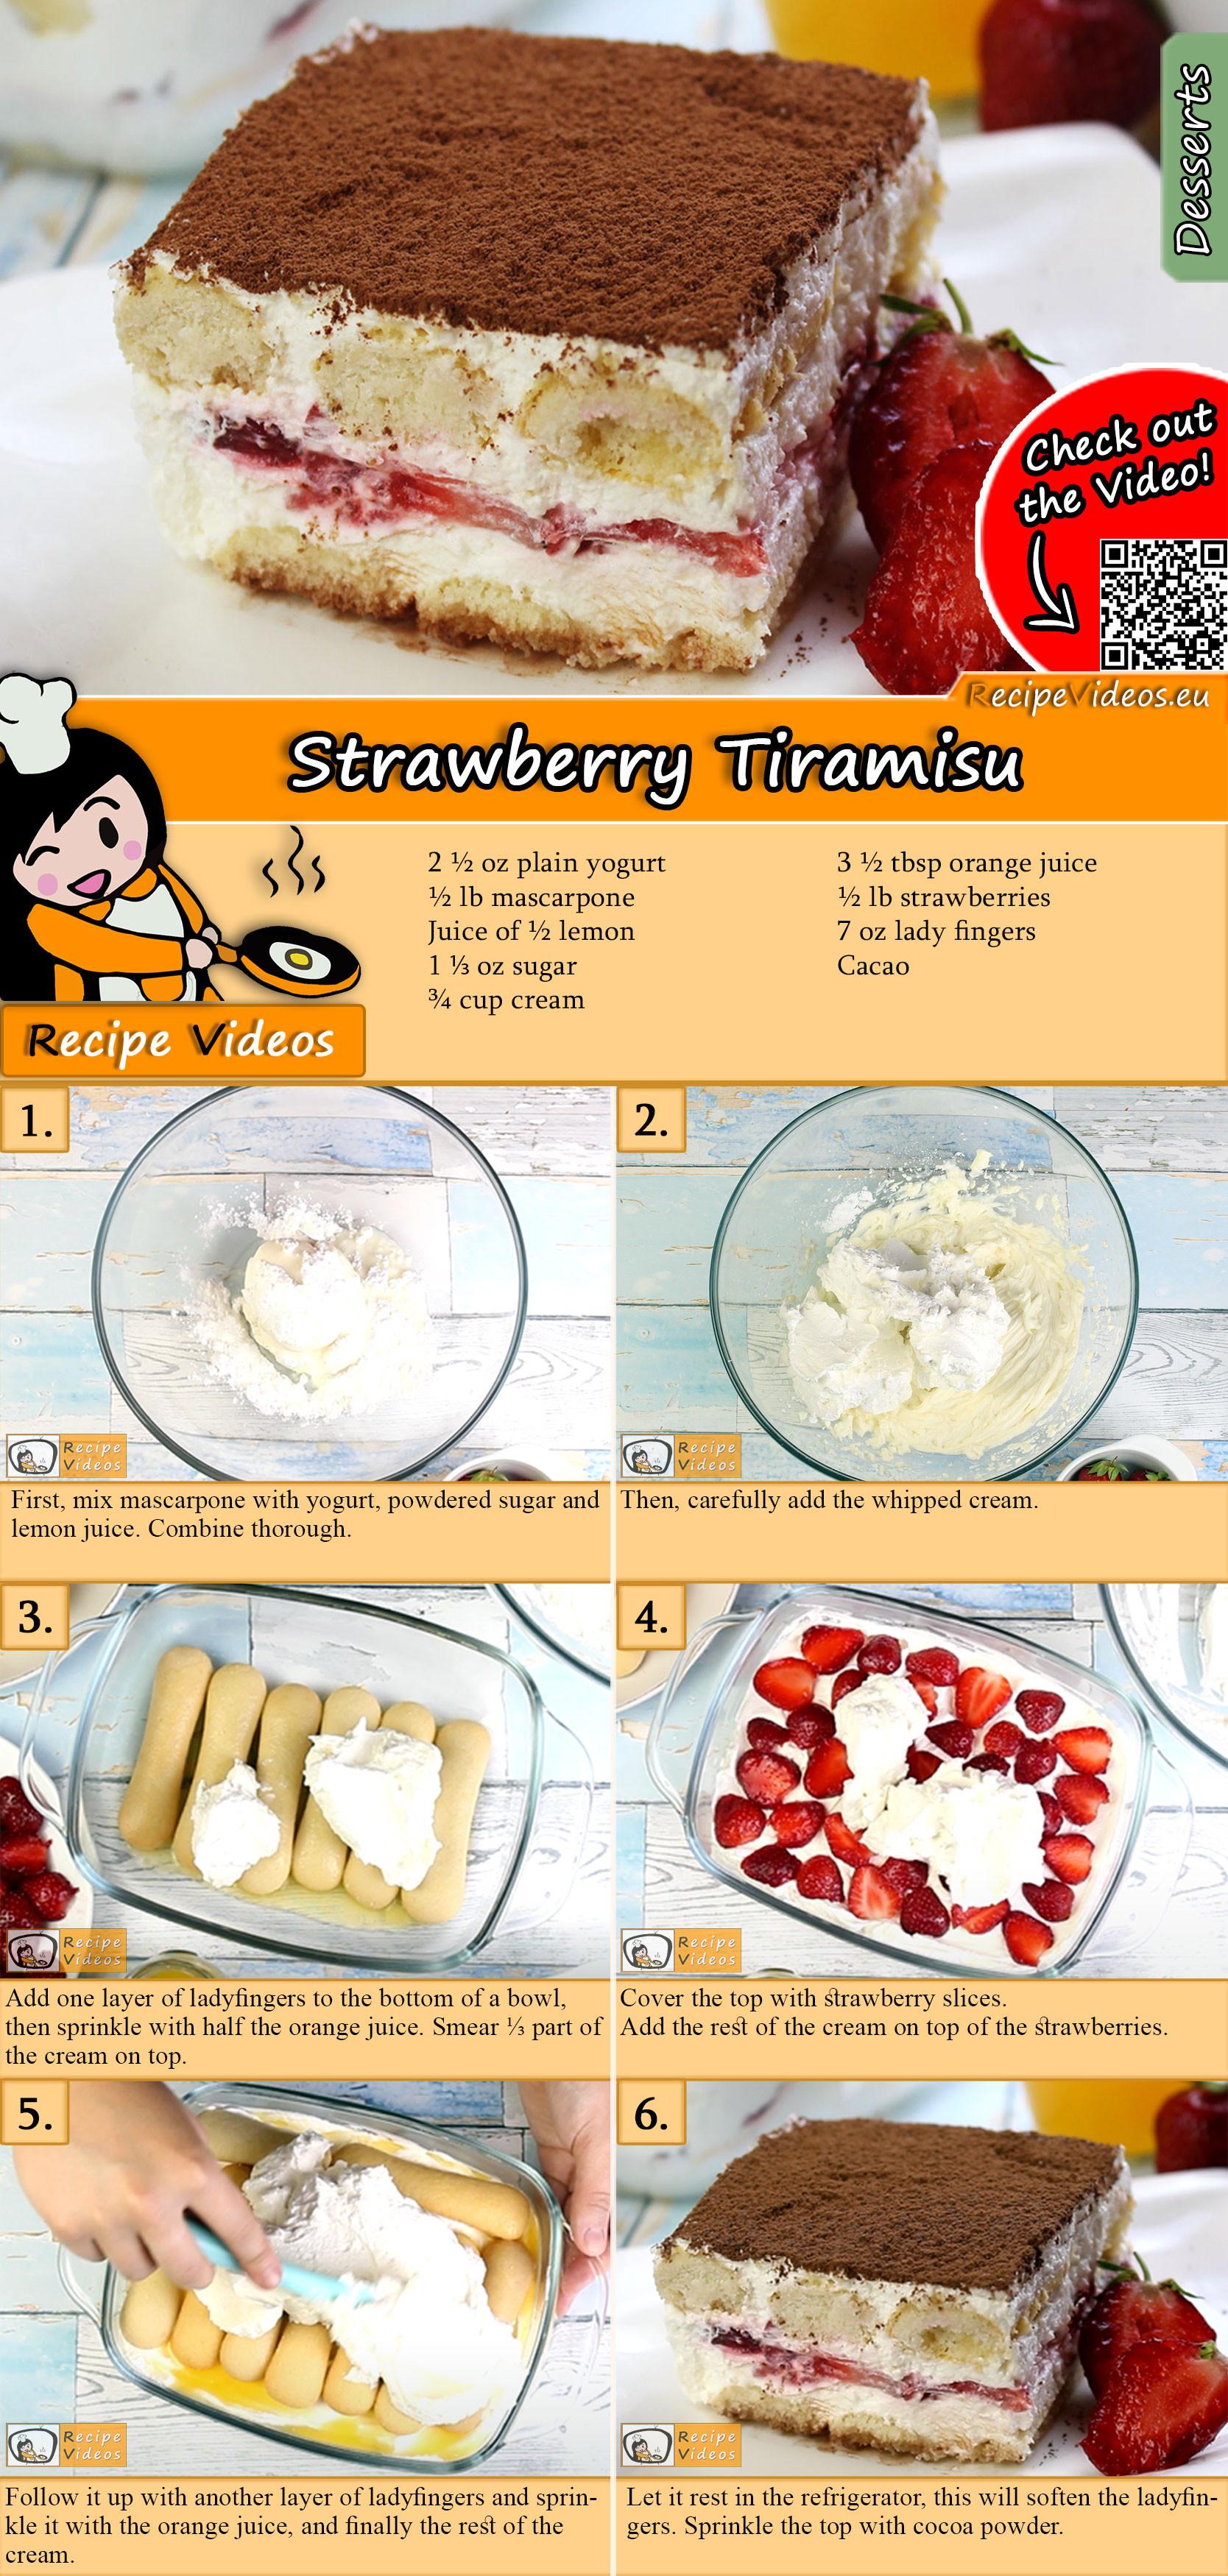 Strawberry Tiramisu recipe with video